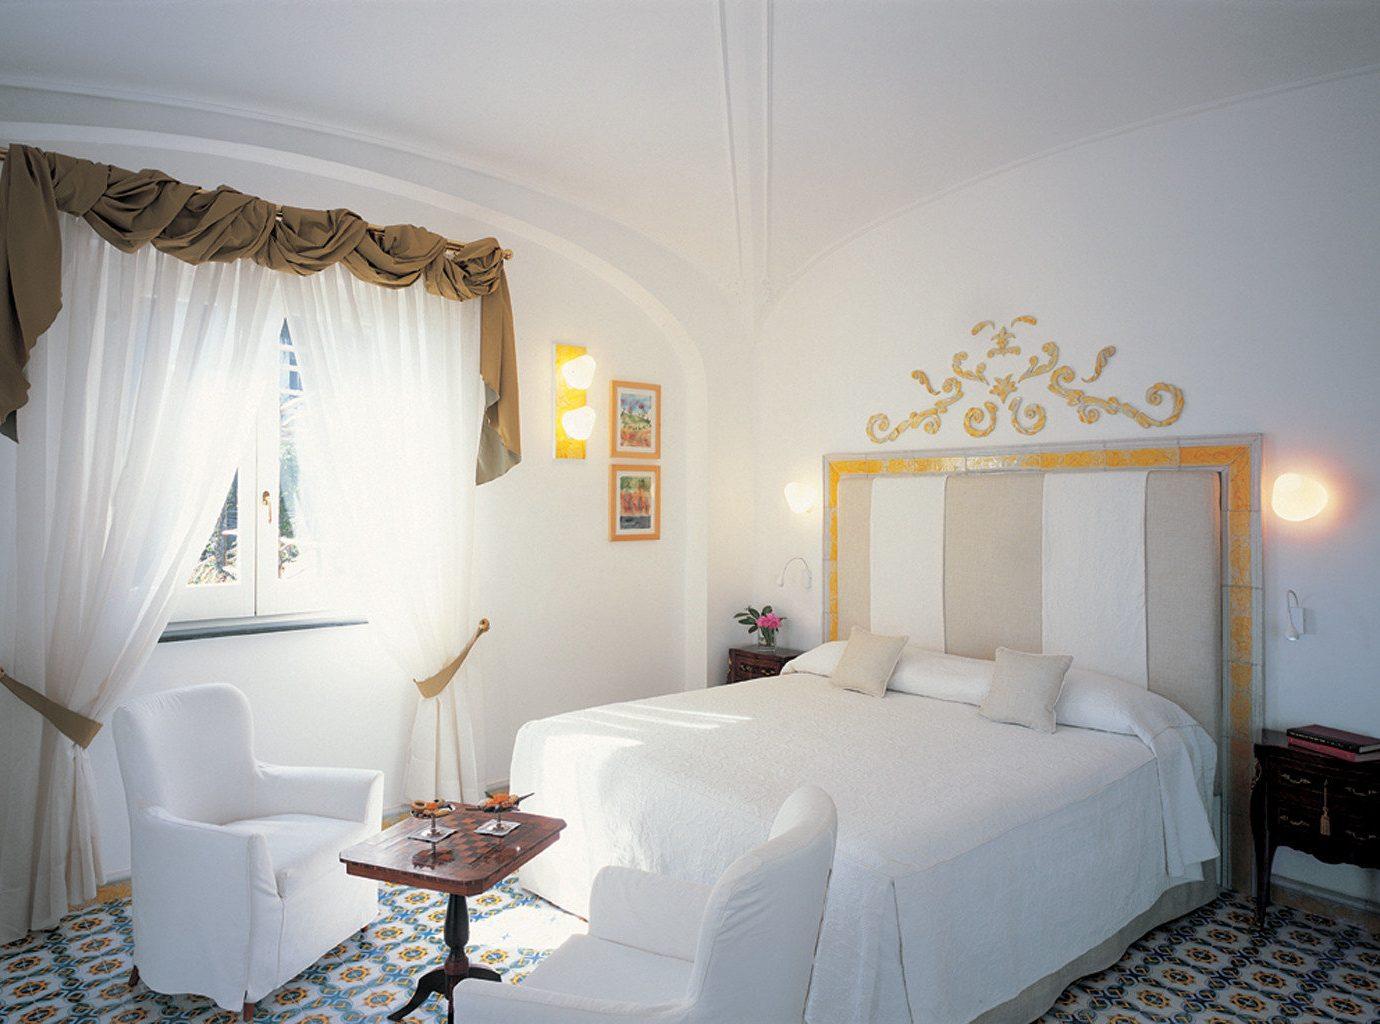 Bedroom at Hotel Santa Caterina, Amalfi